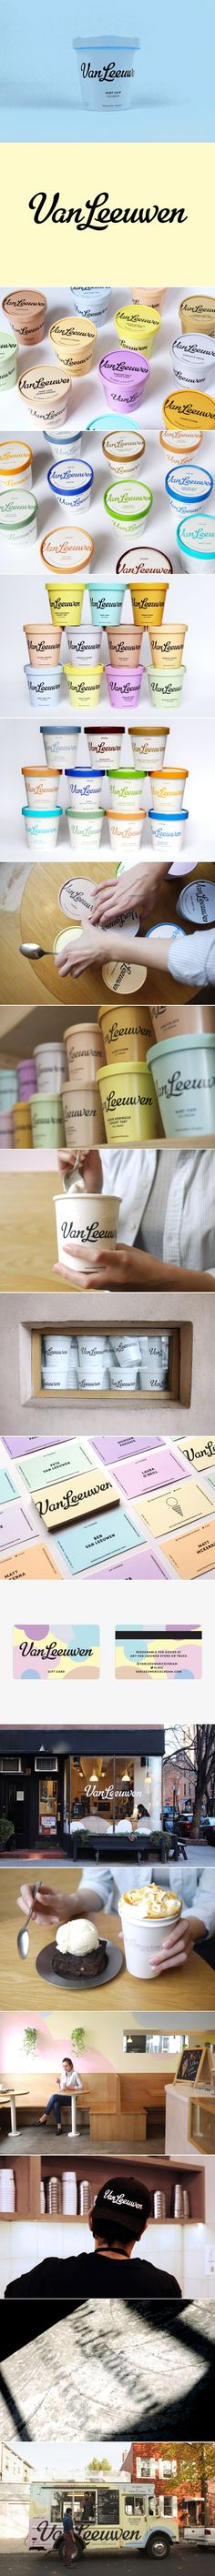 The Graphic, Gorgeous New Look of Van Leeuwen Artisan Ice Cream — The Dieline   Packaging & Branding Design & Innovation News